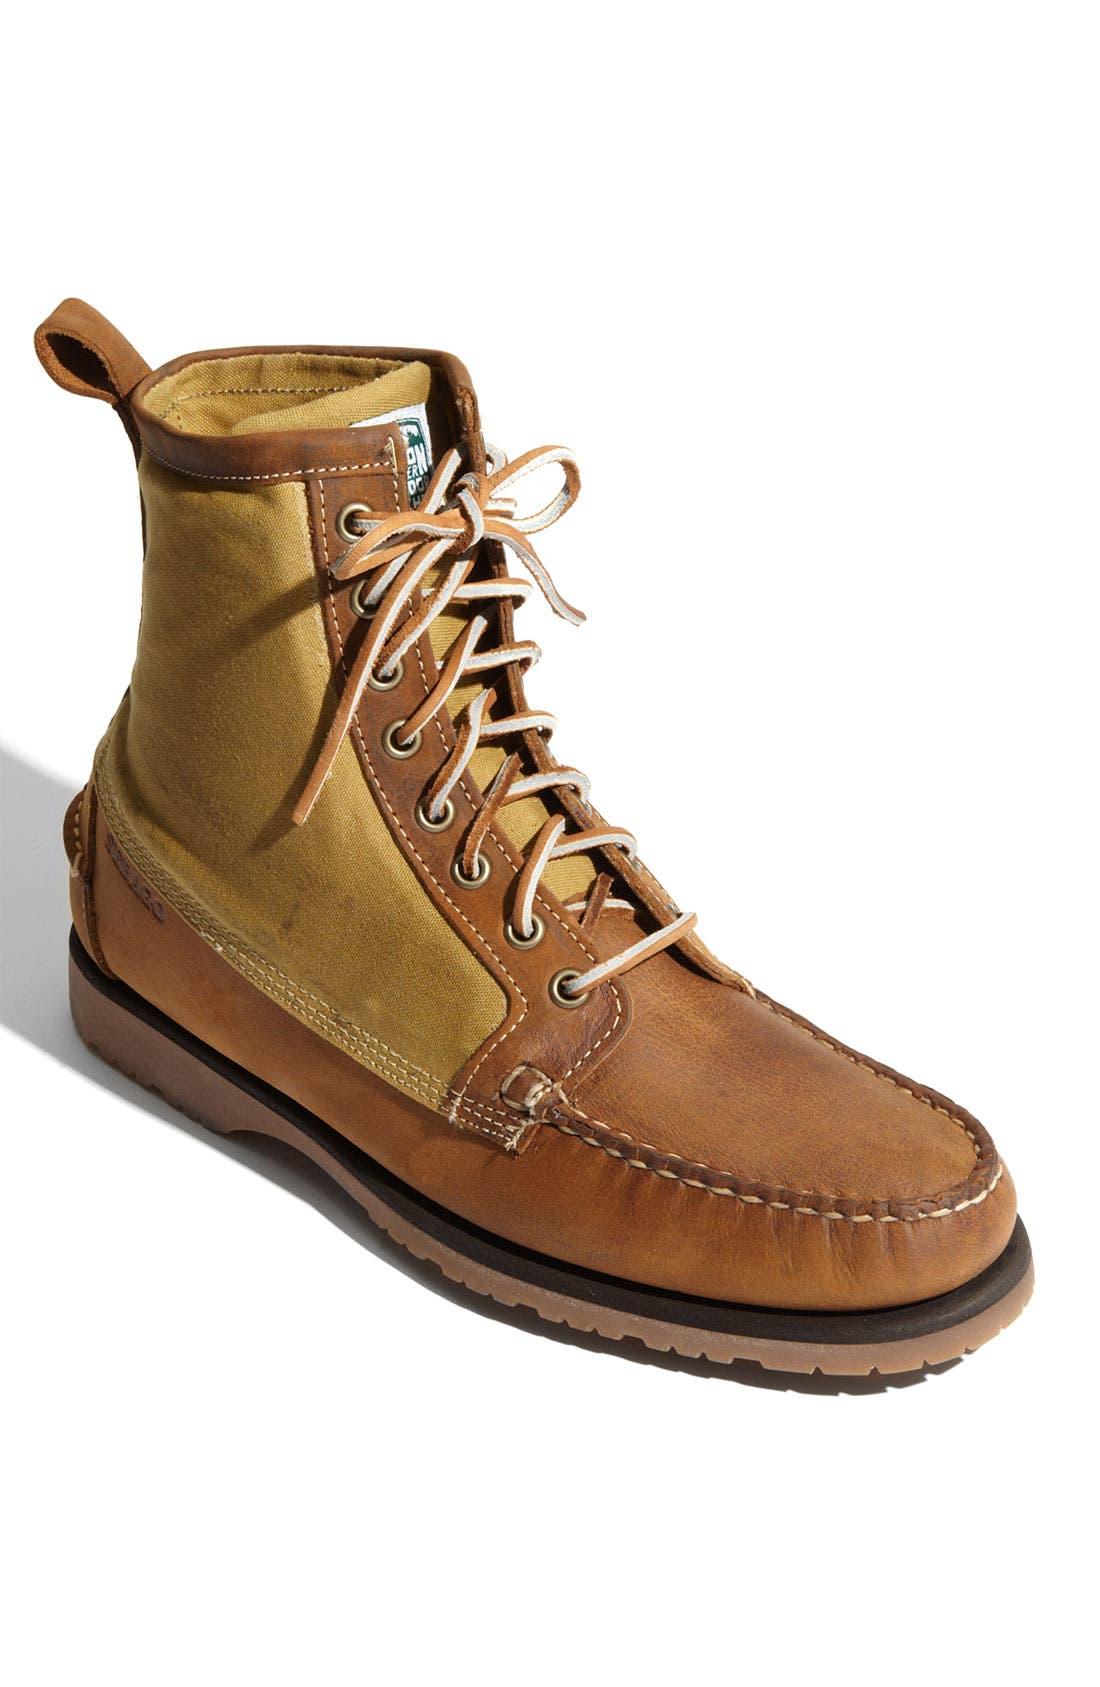 Main Image - Sebago 'Kettle' Boot